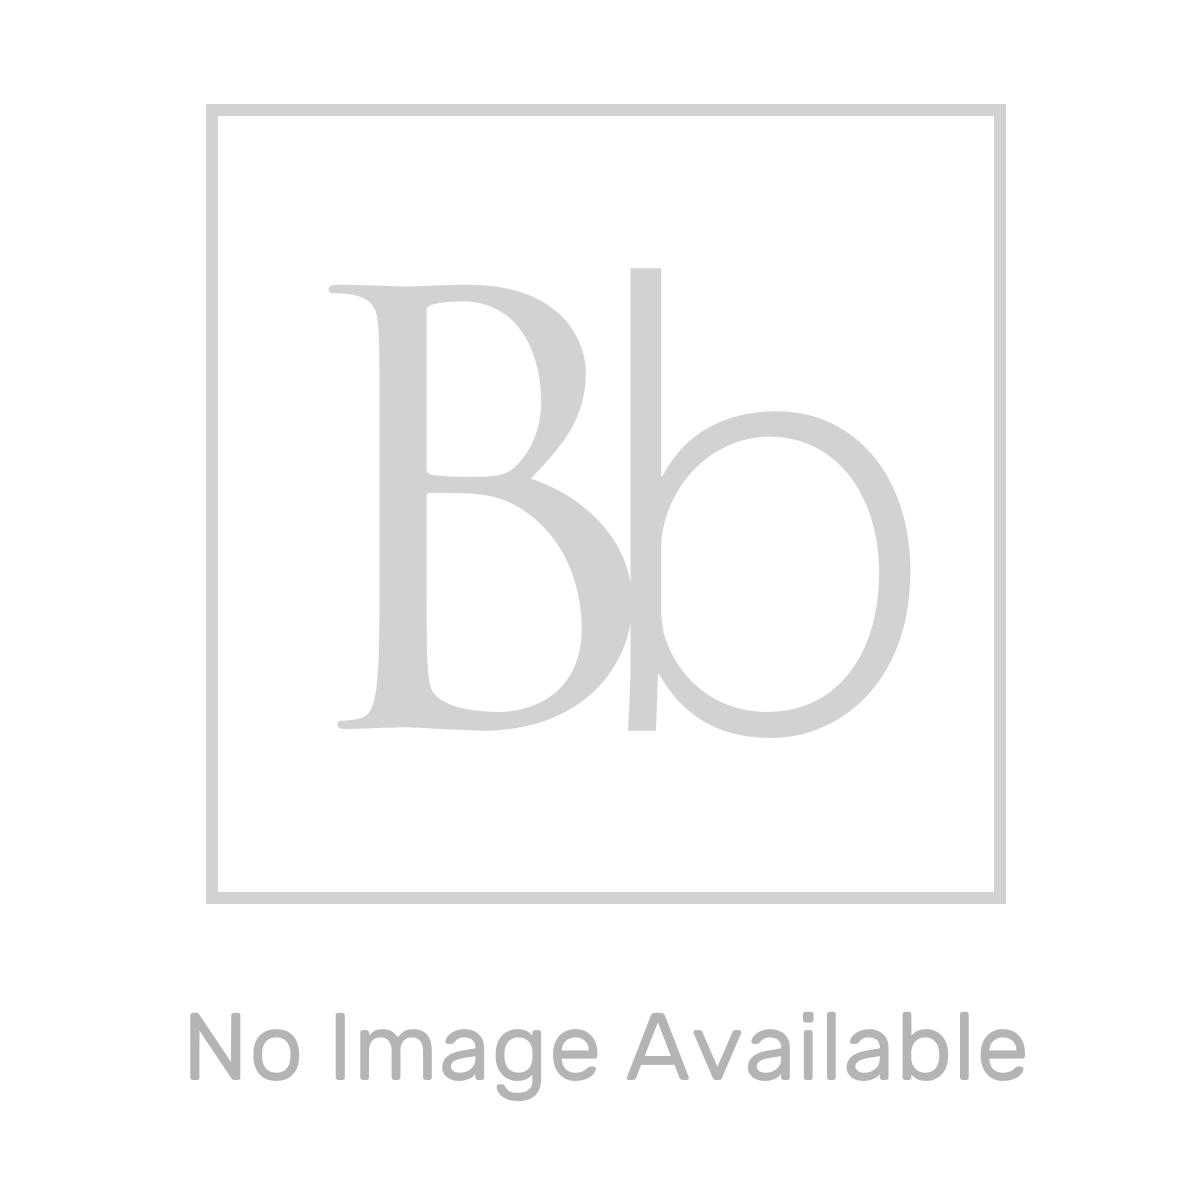 RAK Series 600 Bathroom Suite with Sliding Shower Enclosure Handle